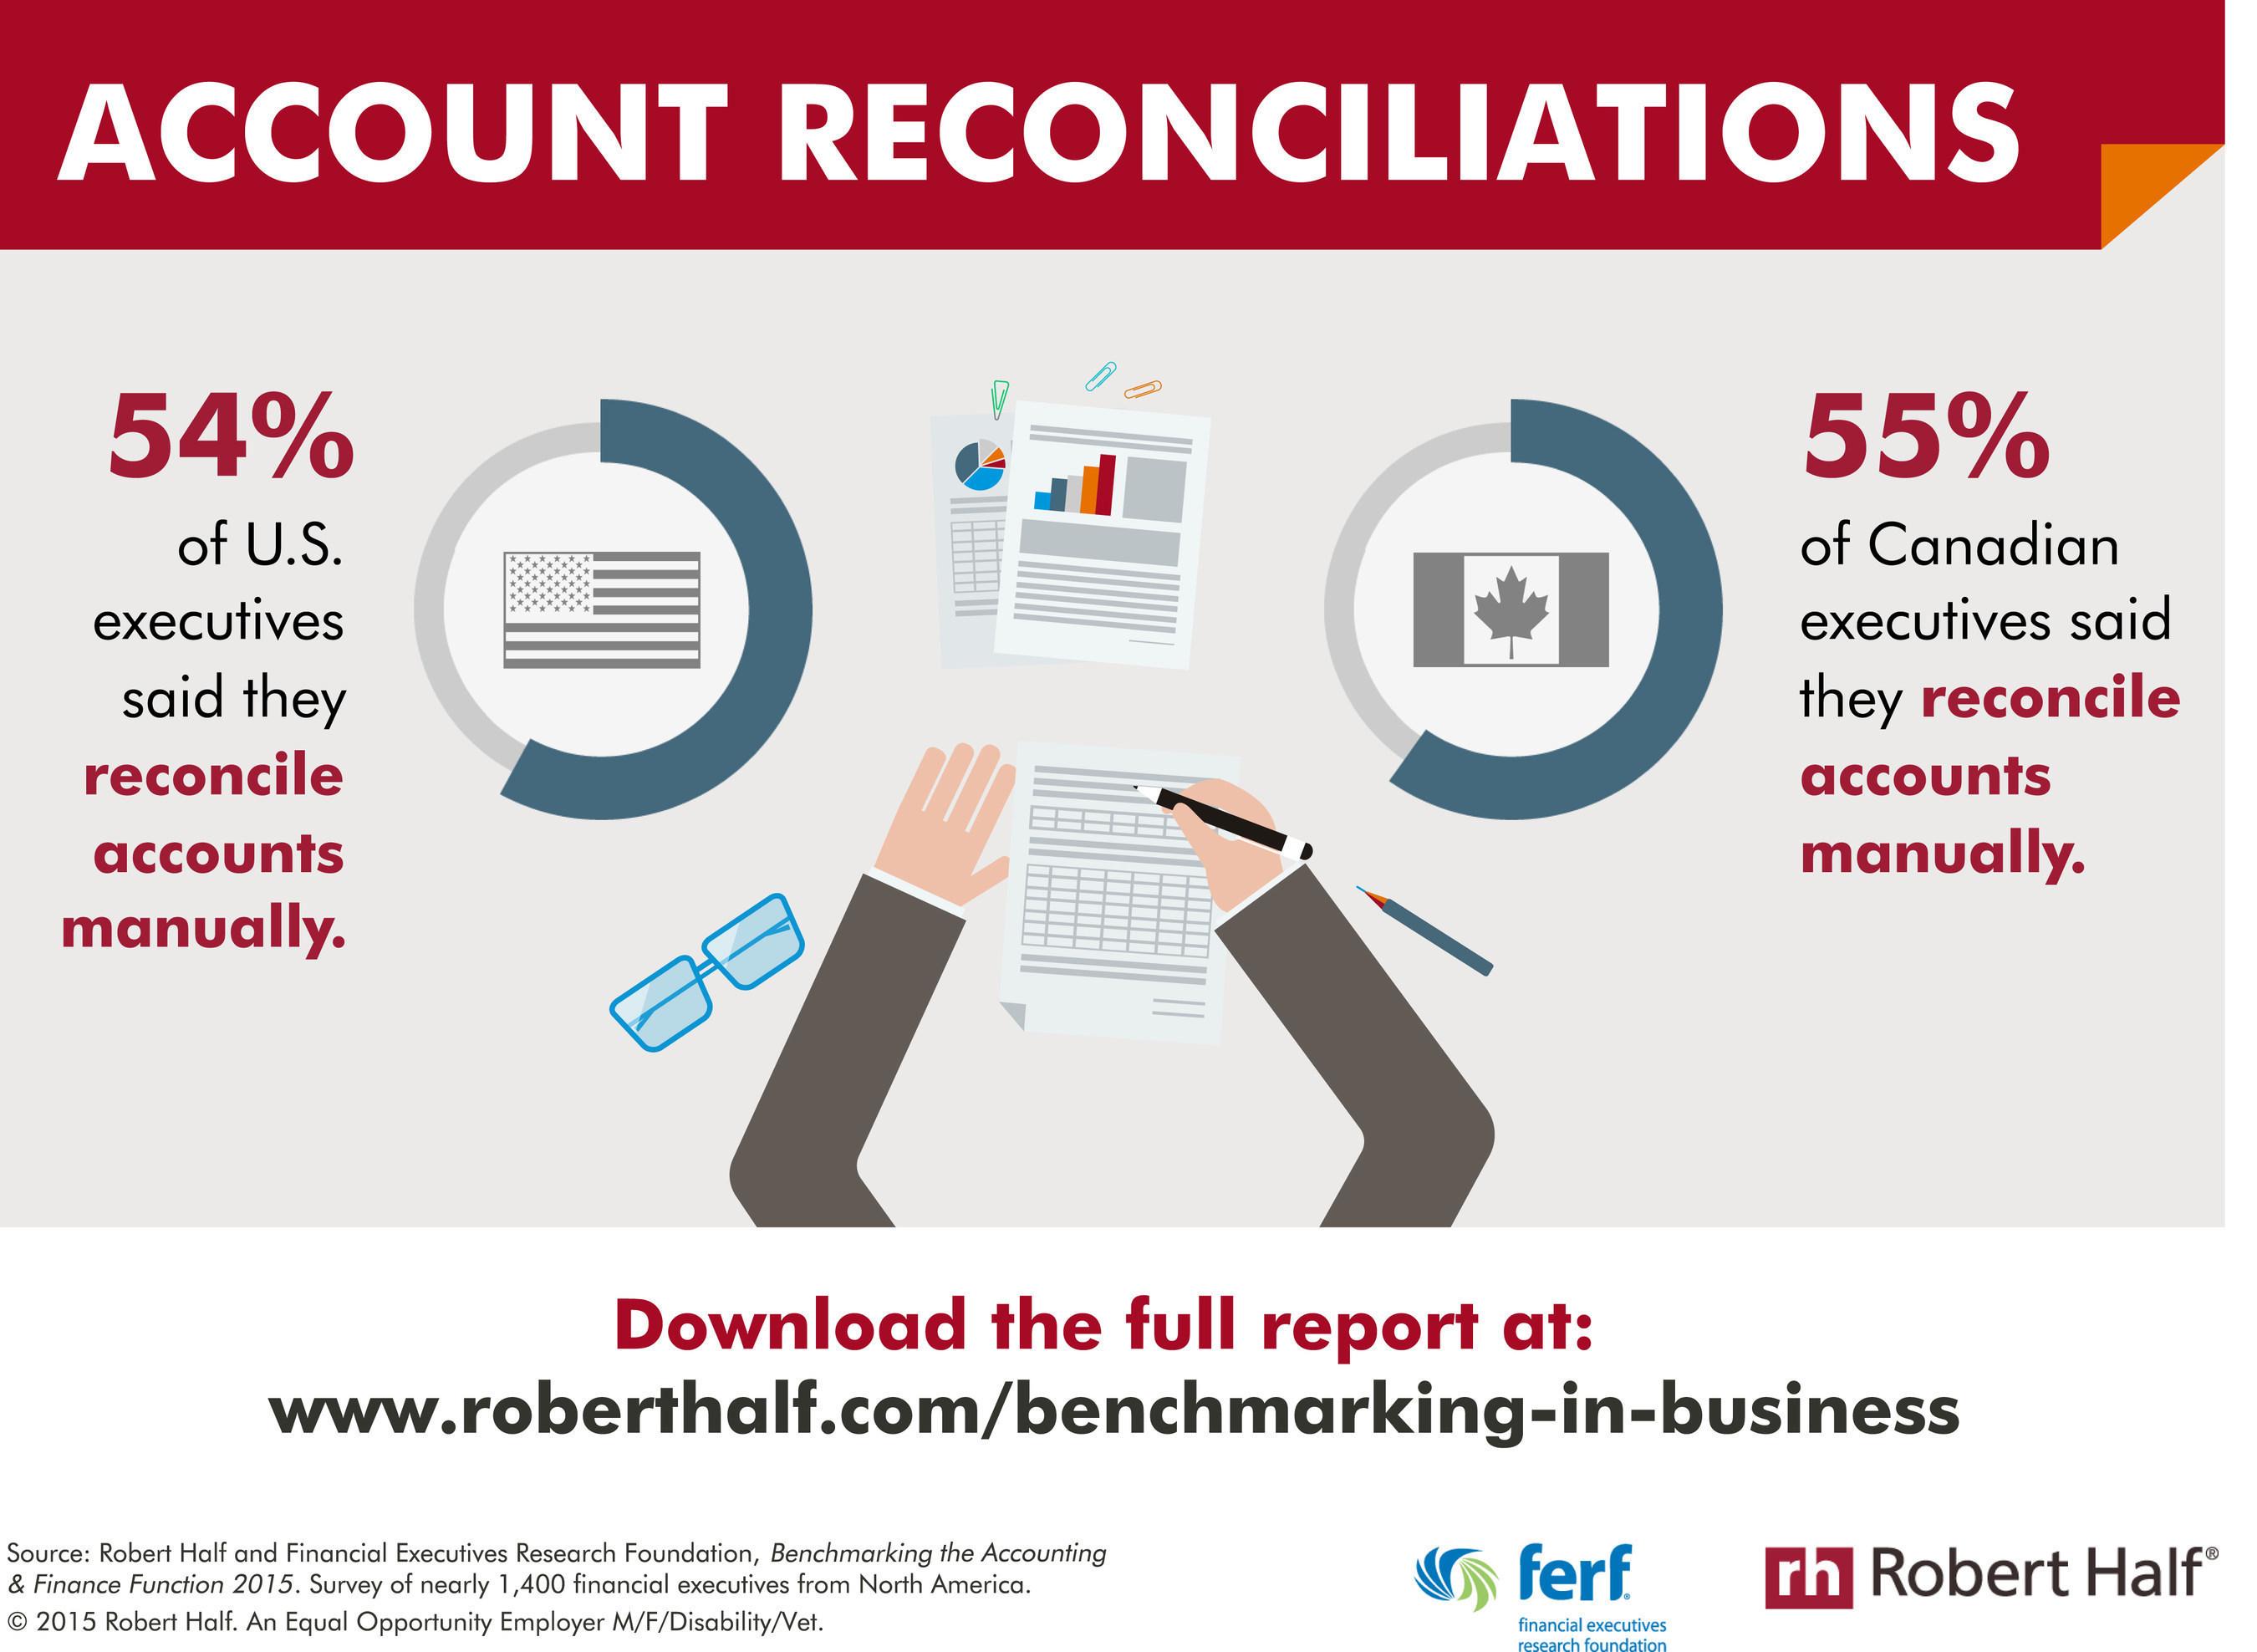 Manual reconciliation of accounts.